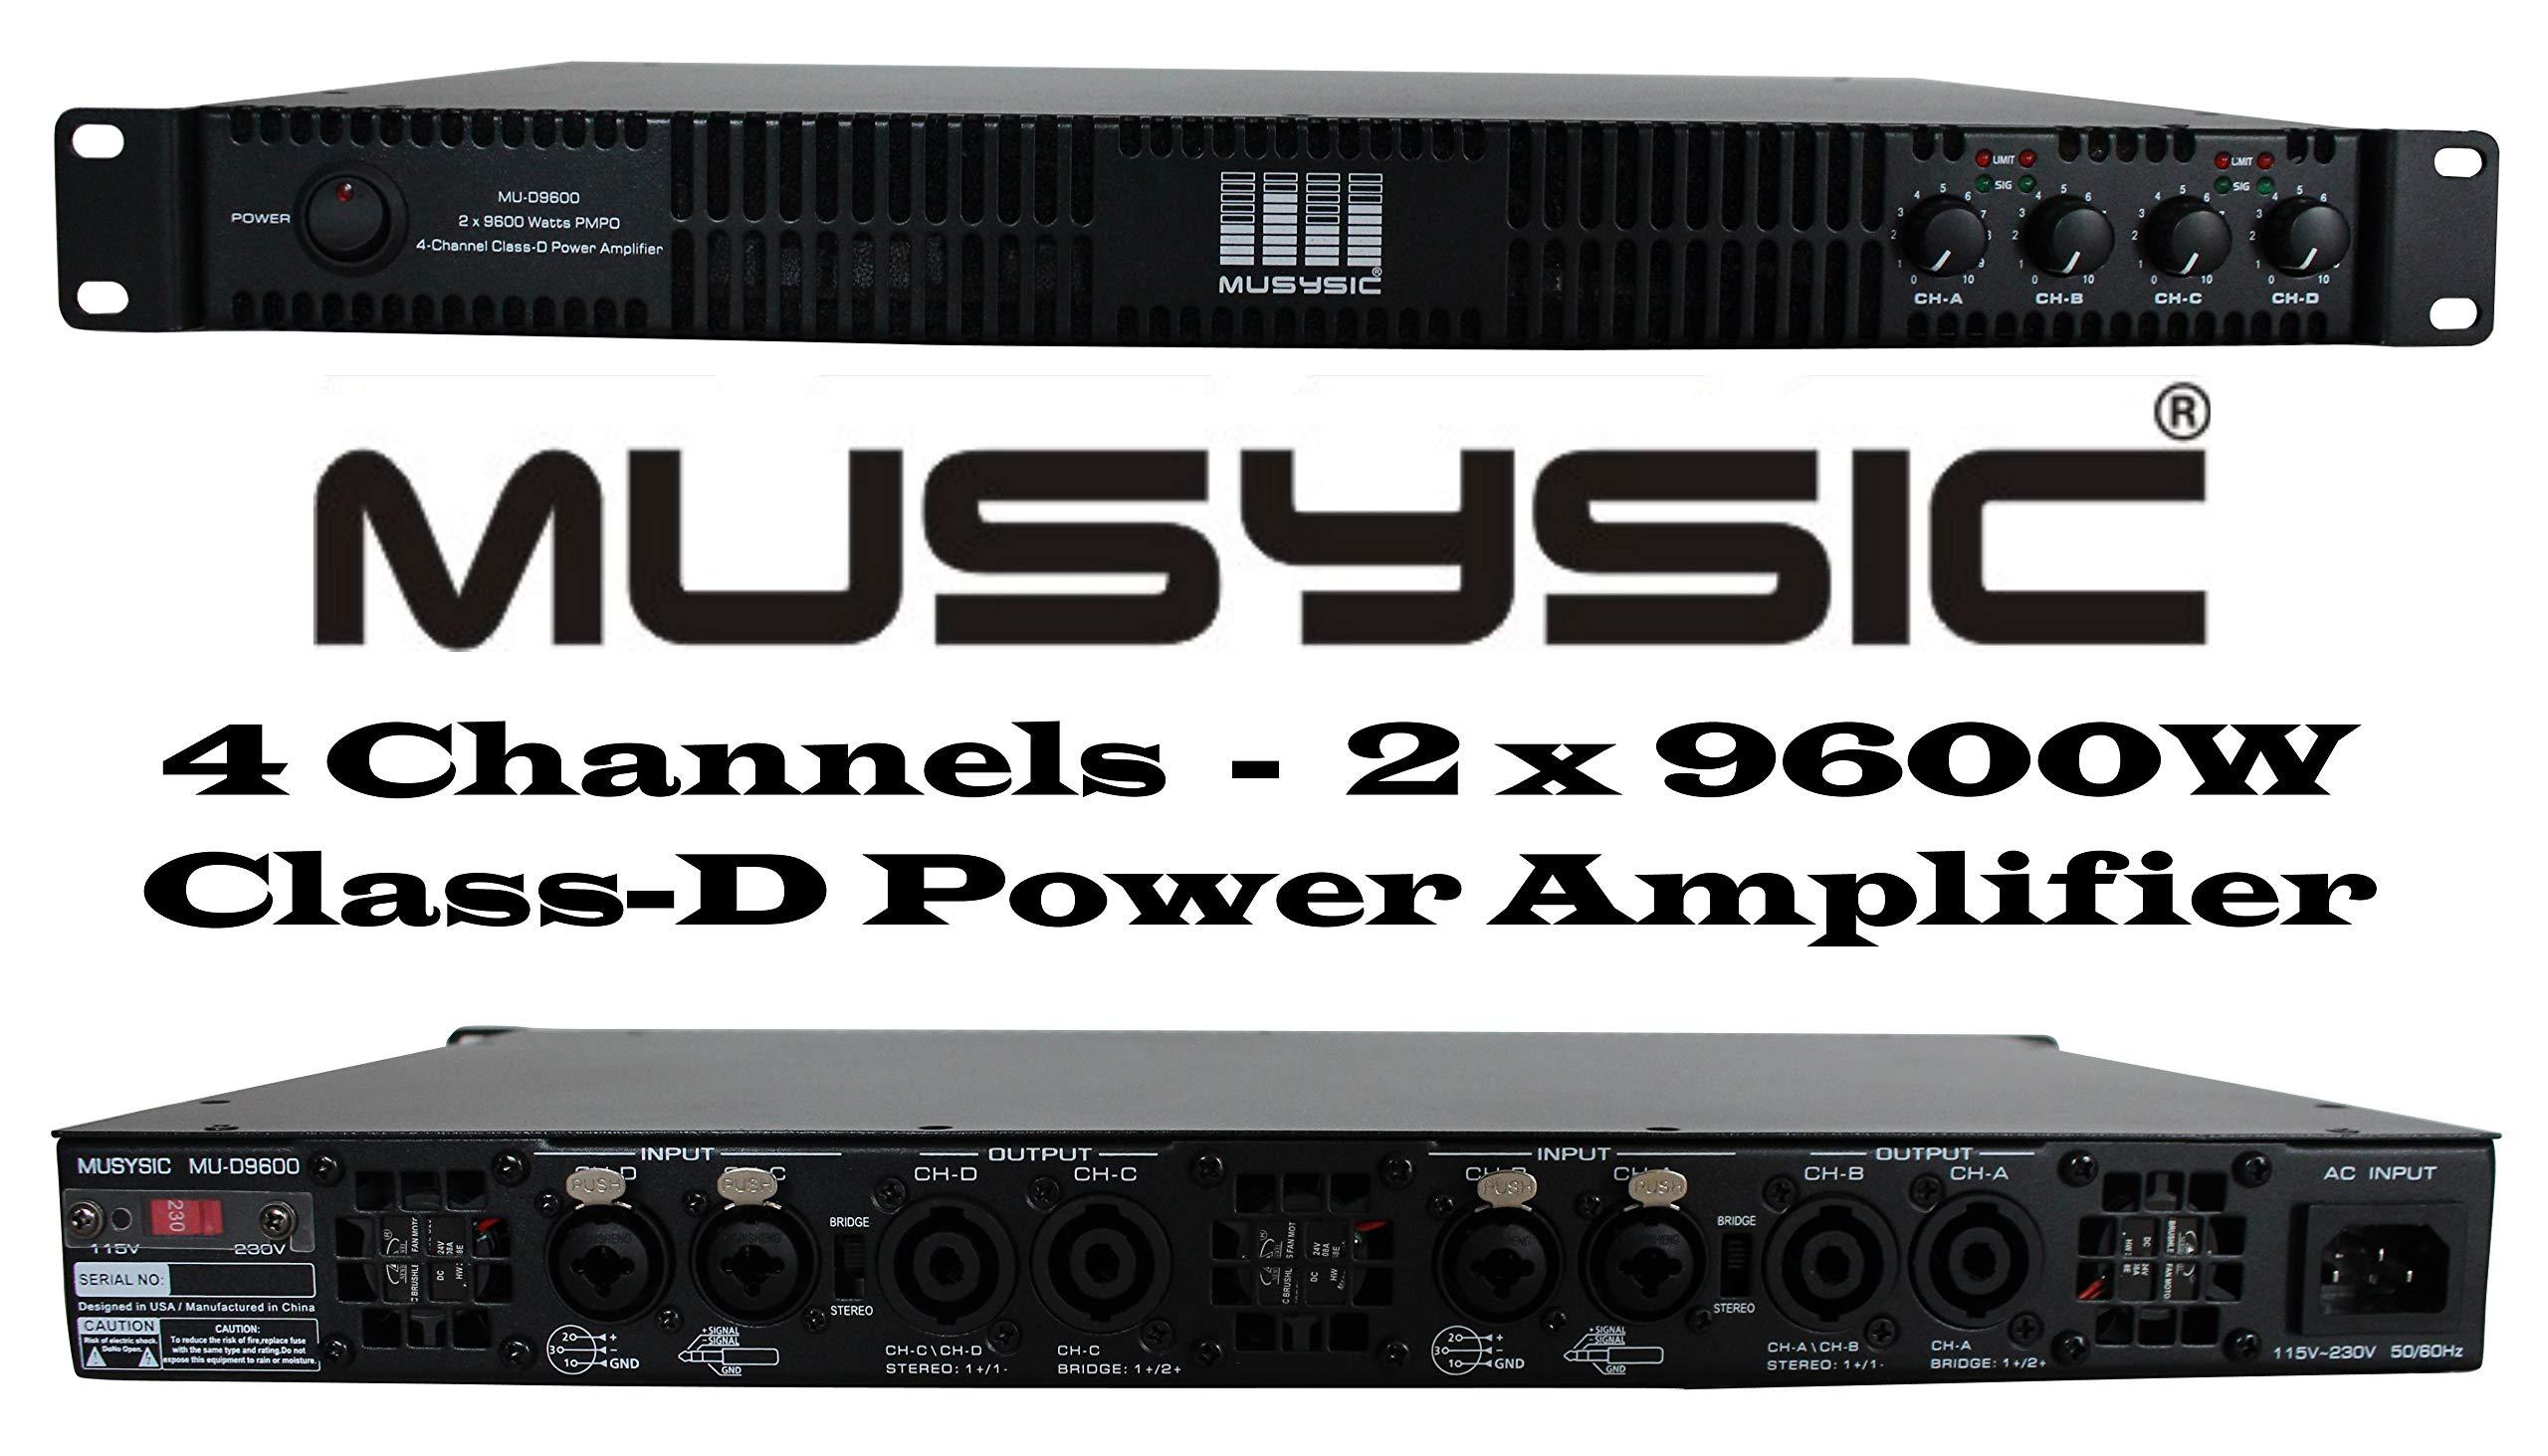 MUSYSIC MU-D9600 Professional 4-Channels 2x9600 Watts D-Class 1U Power Amplifier by MUSYSIC